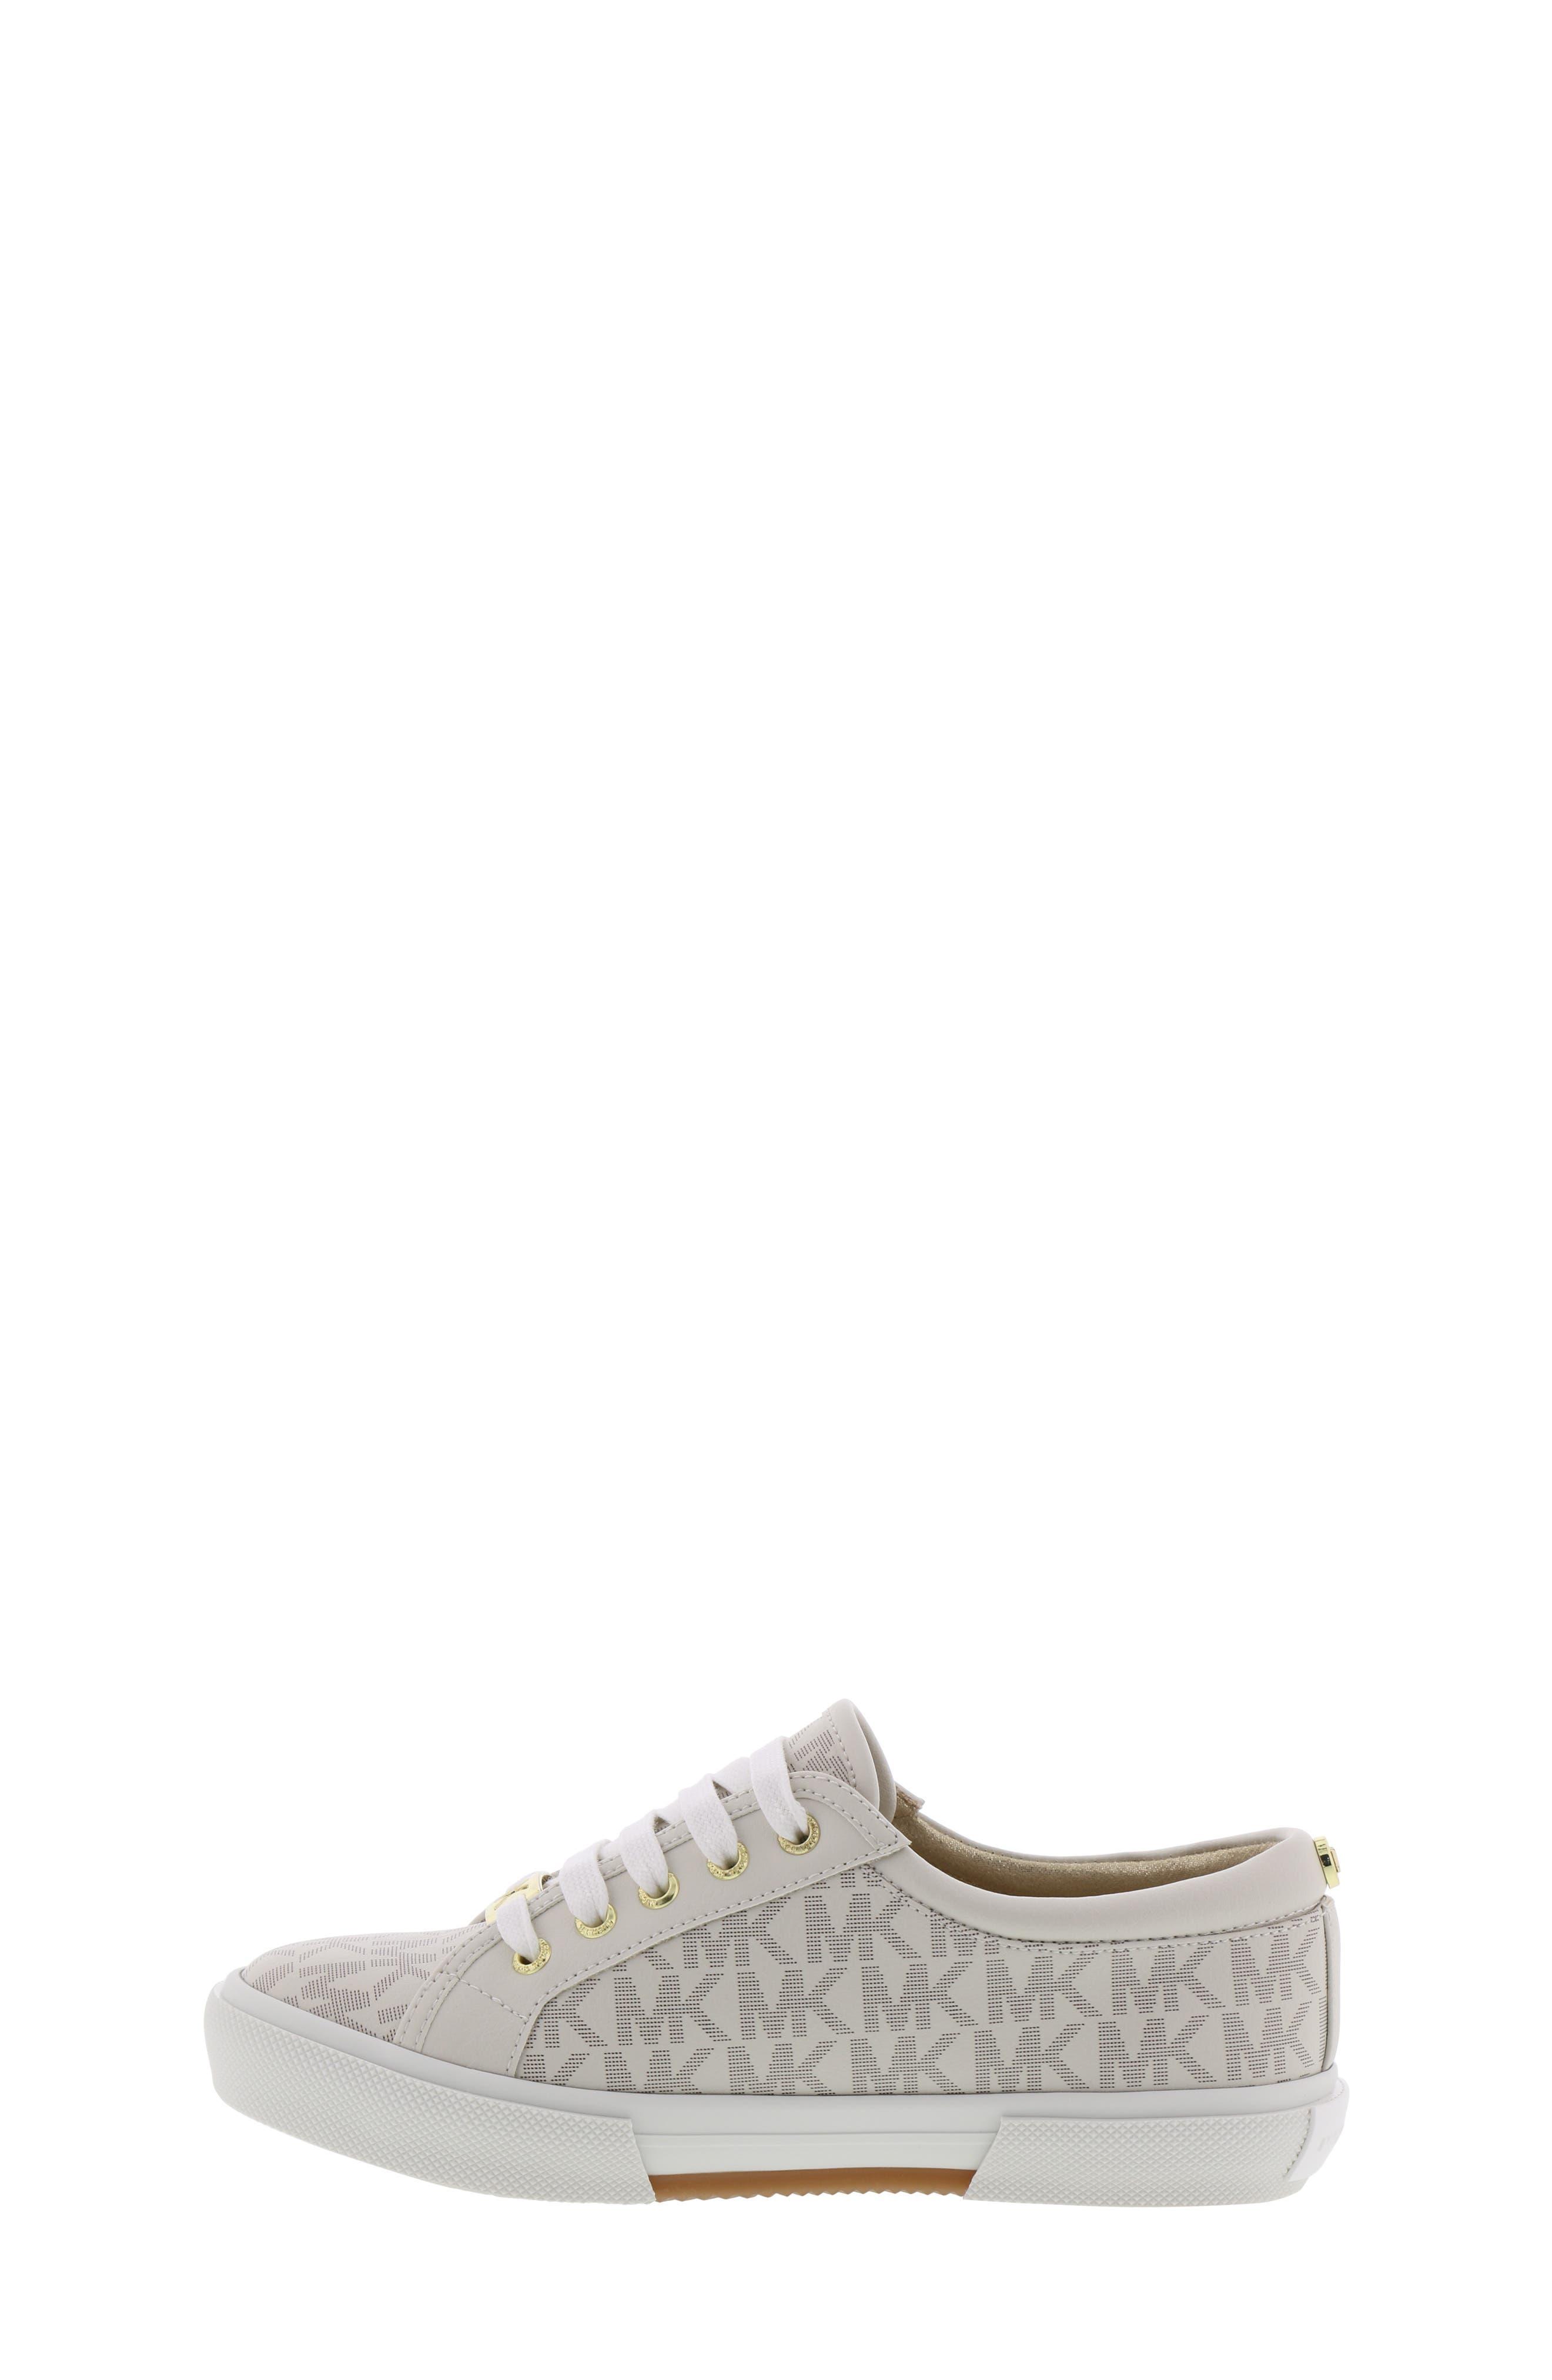 MICHAEL MICHAEL KORS,                             Ima Rebel Sneaker,                             Alternate thumbnail 9, color,                             VANILLA